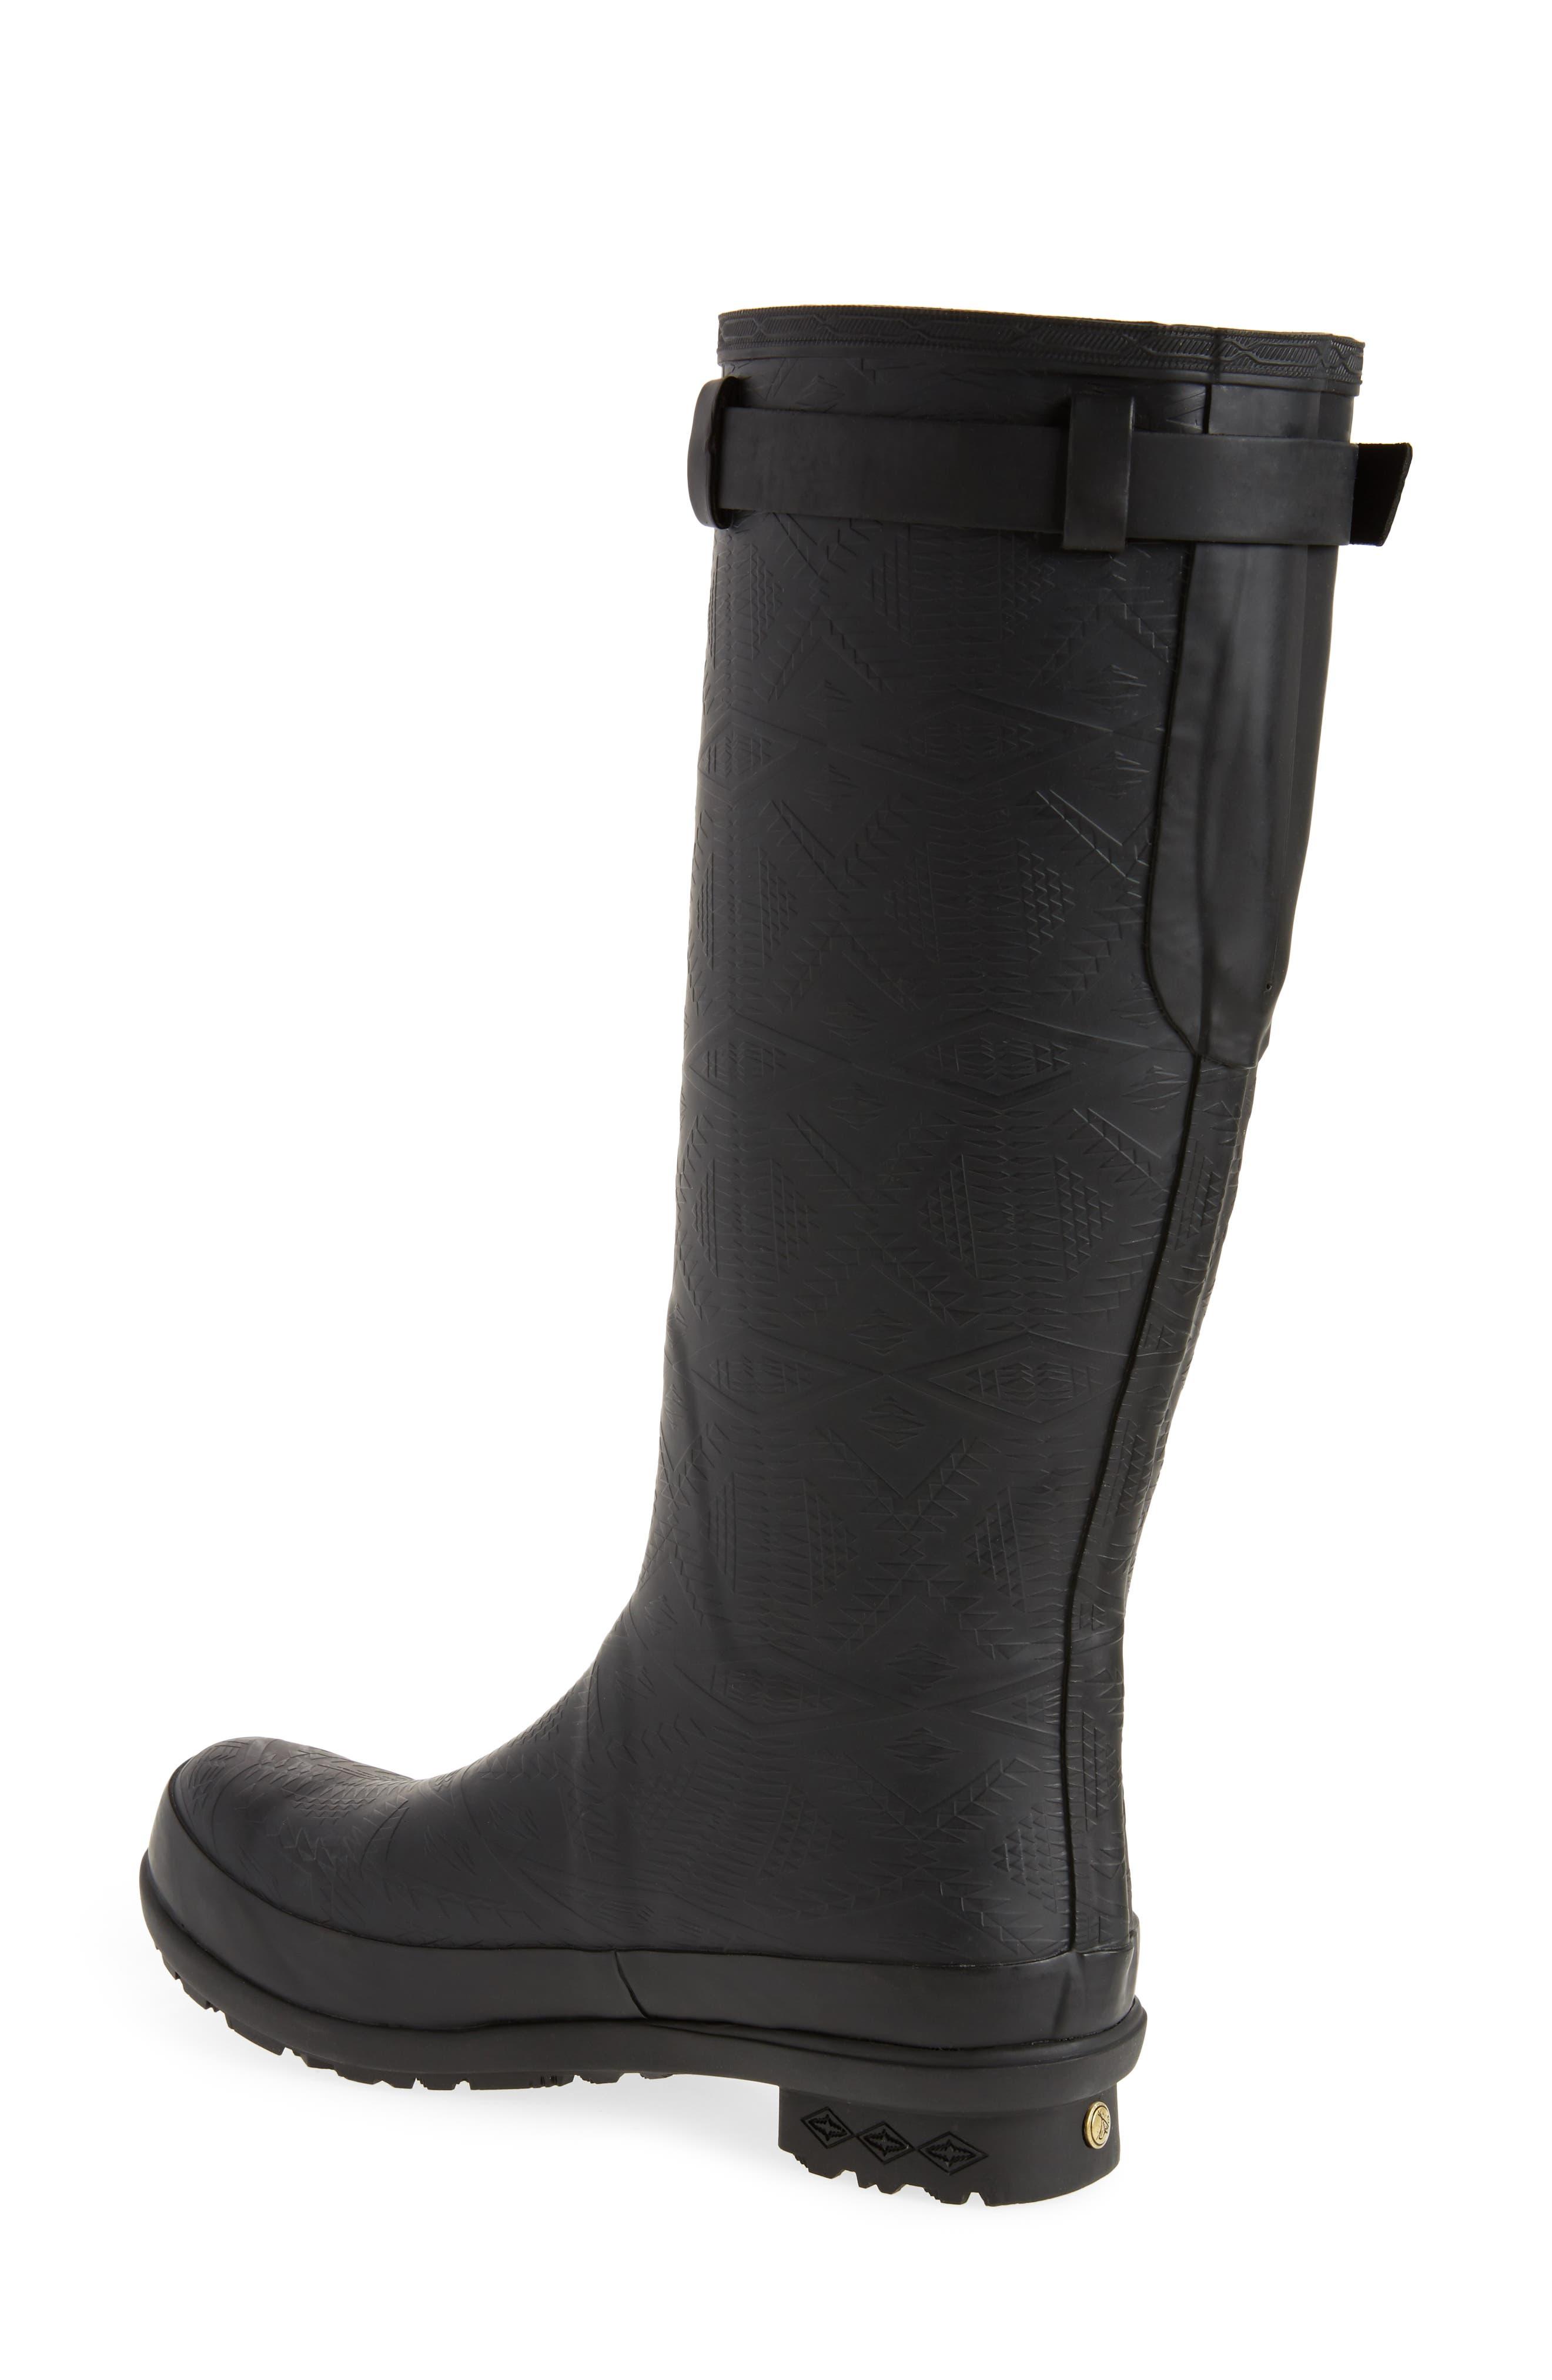 PENDLETON, Embossed Tall Waterproof Rain Boot, Alternate thumbnail 2, color, BLACK